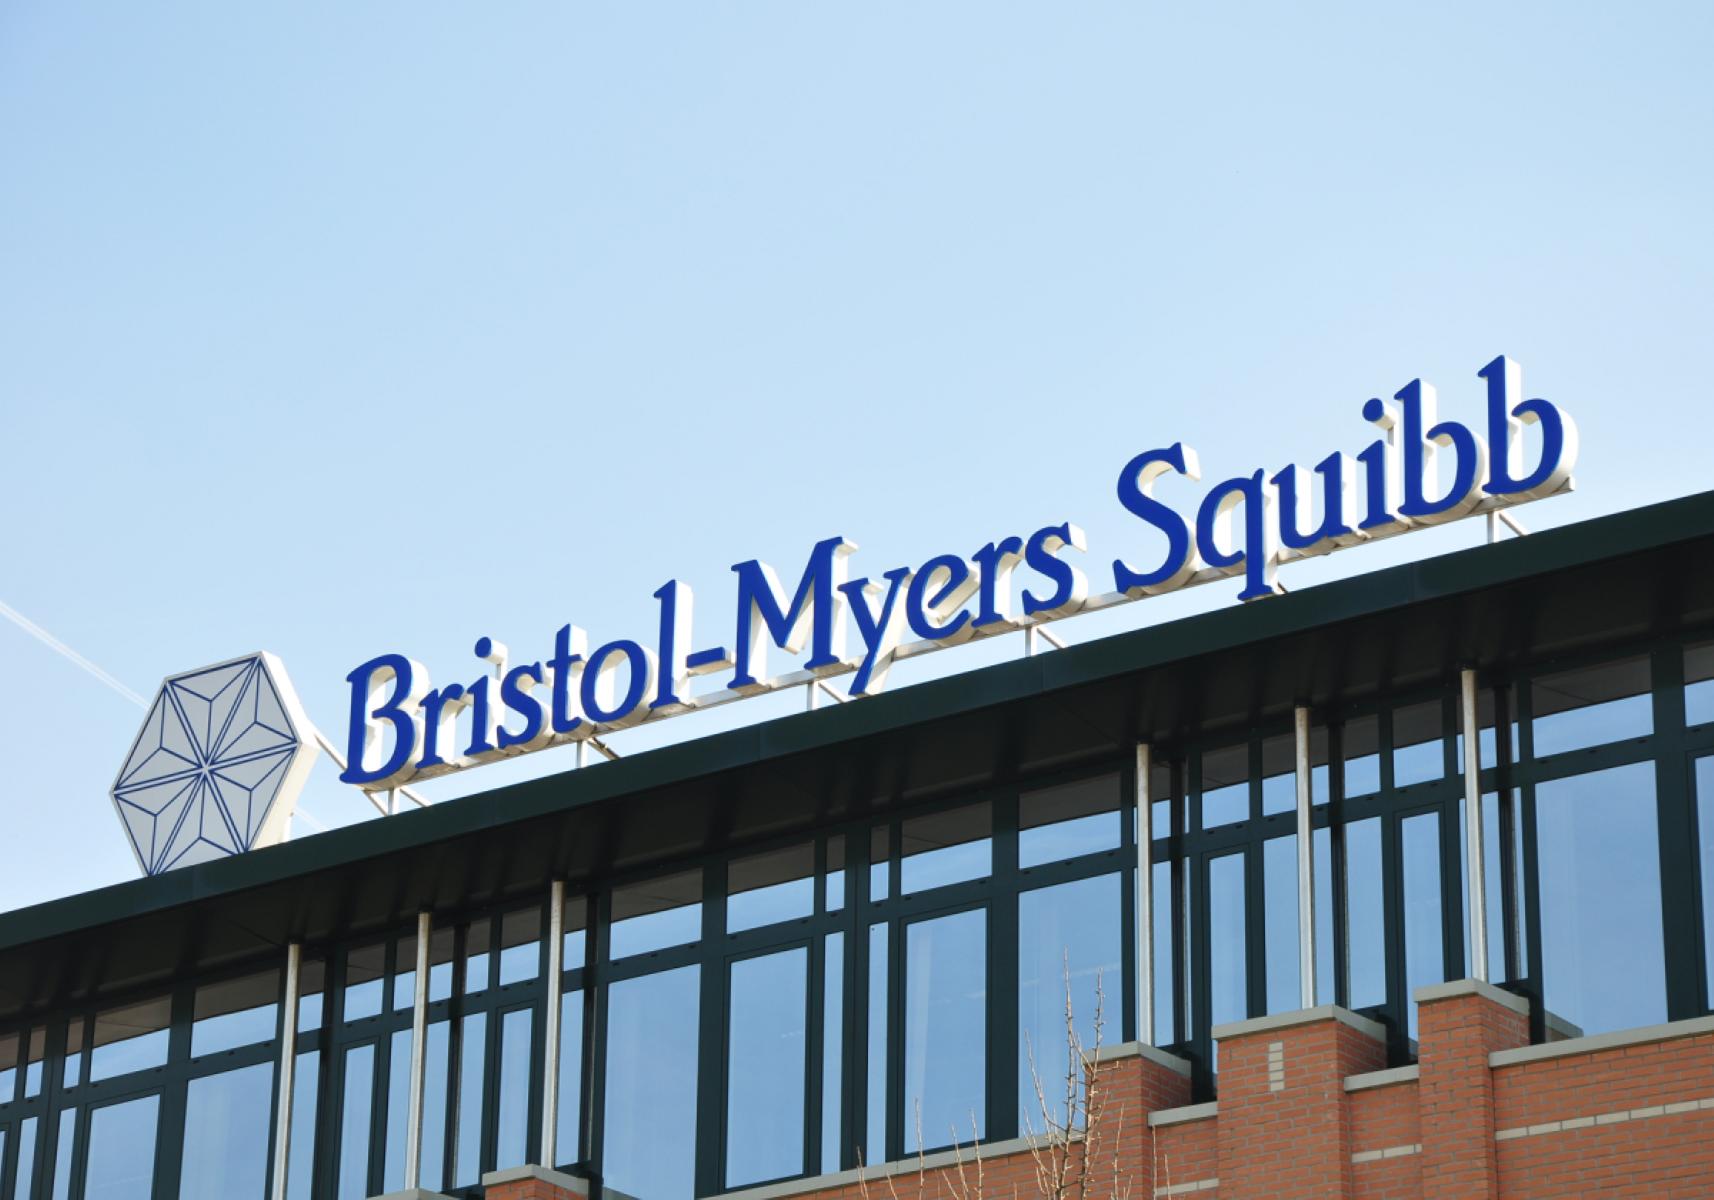 Bristol Myers Squibb: Συμφωνία με το πανεπιστήμιο Rockefeller για θεραπεία της COVID-19